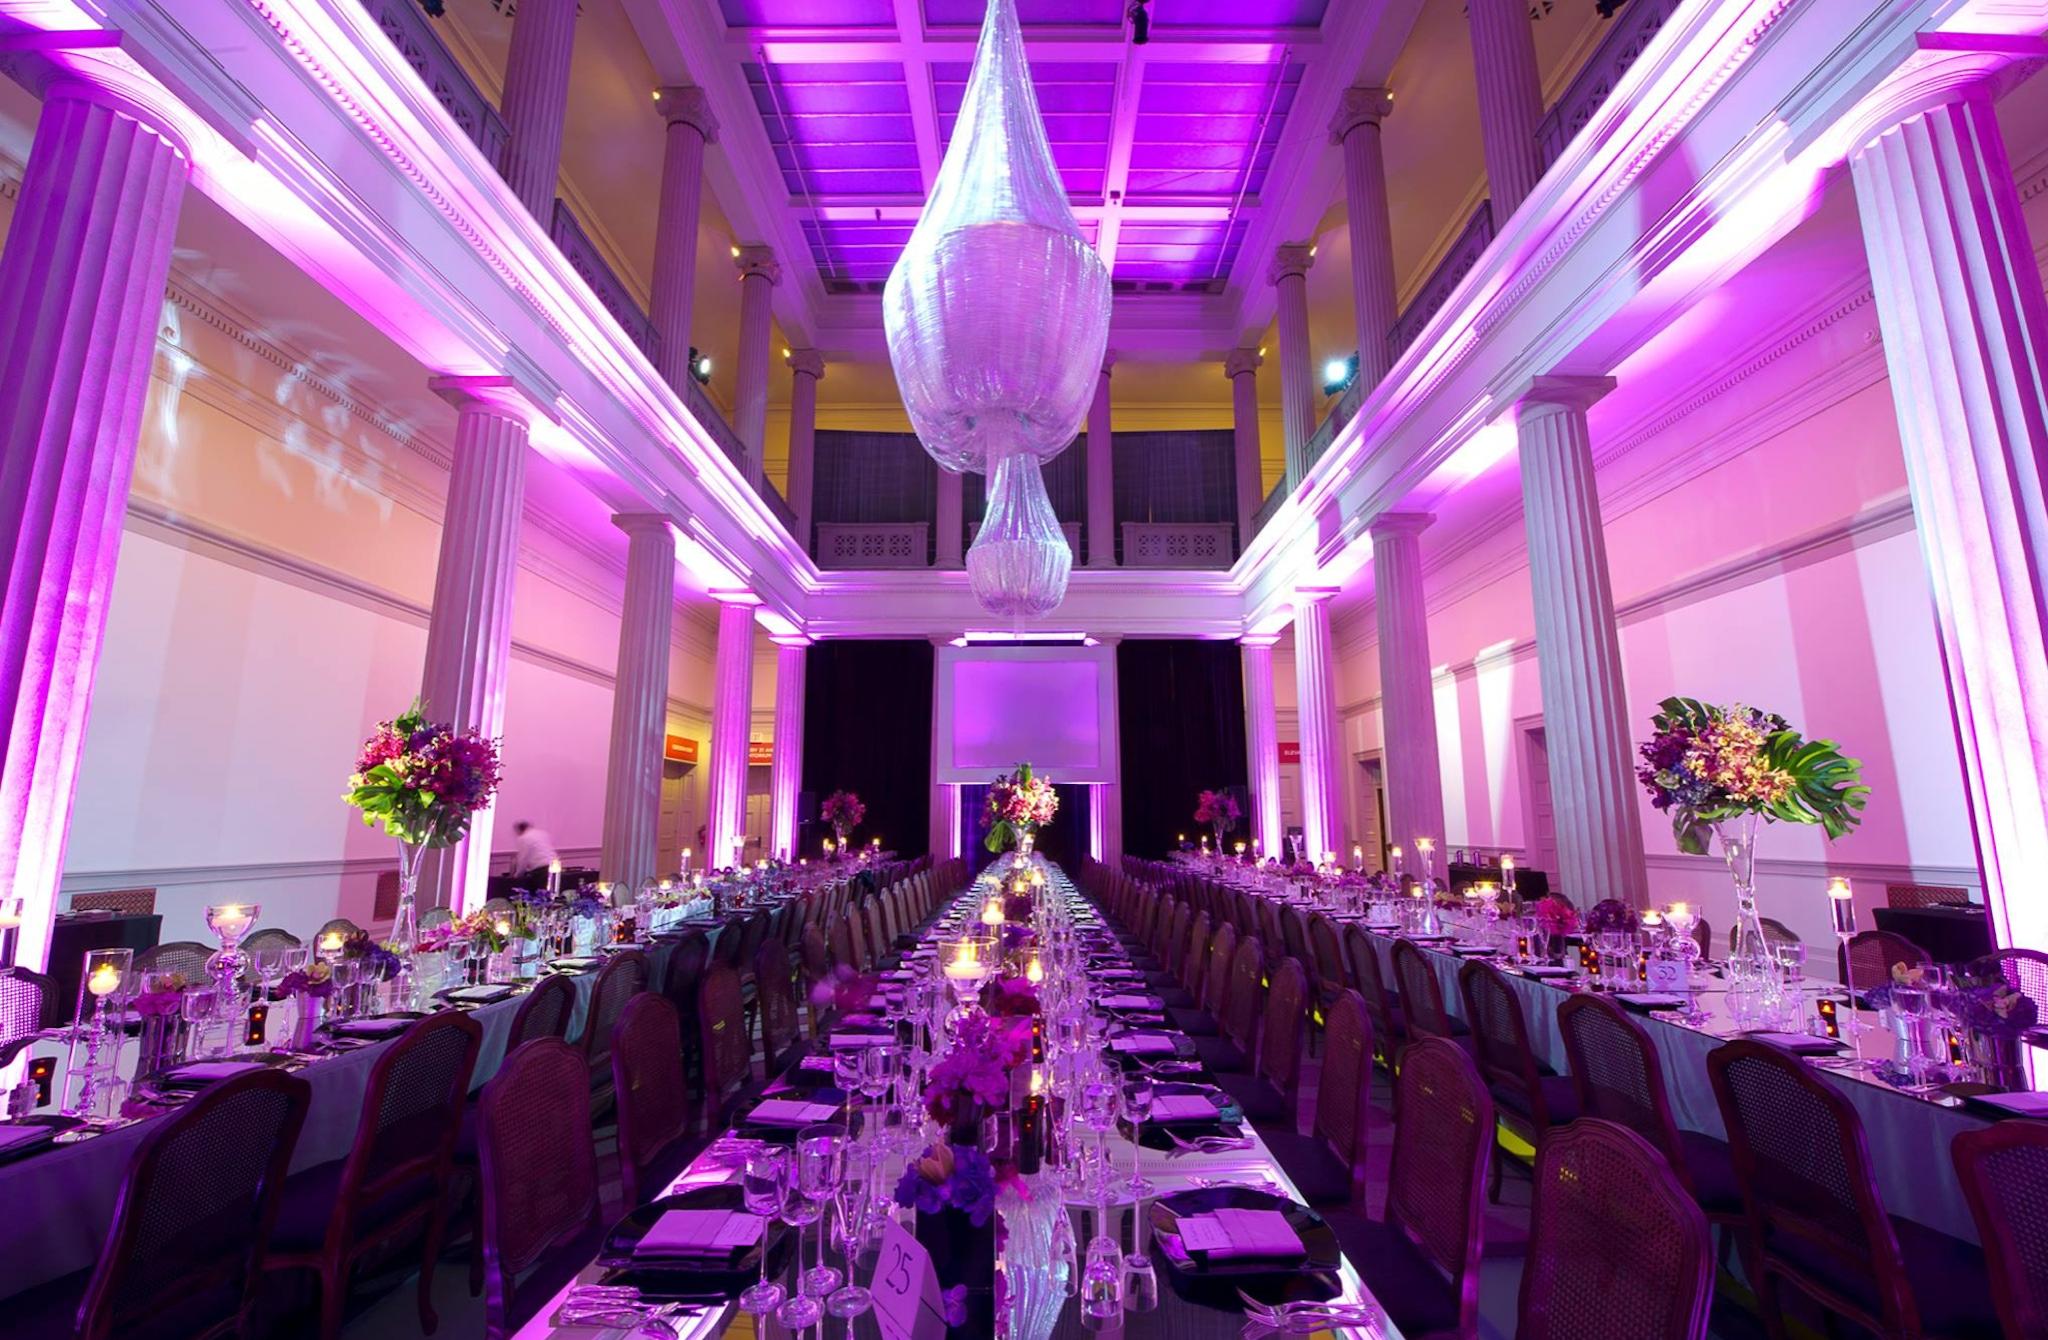 purple lit banquet room